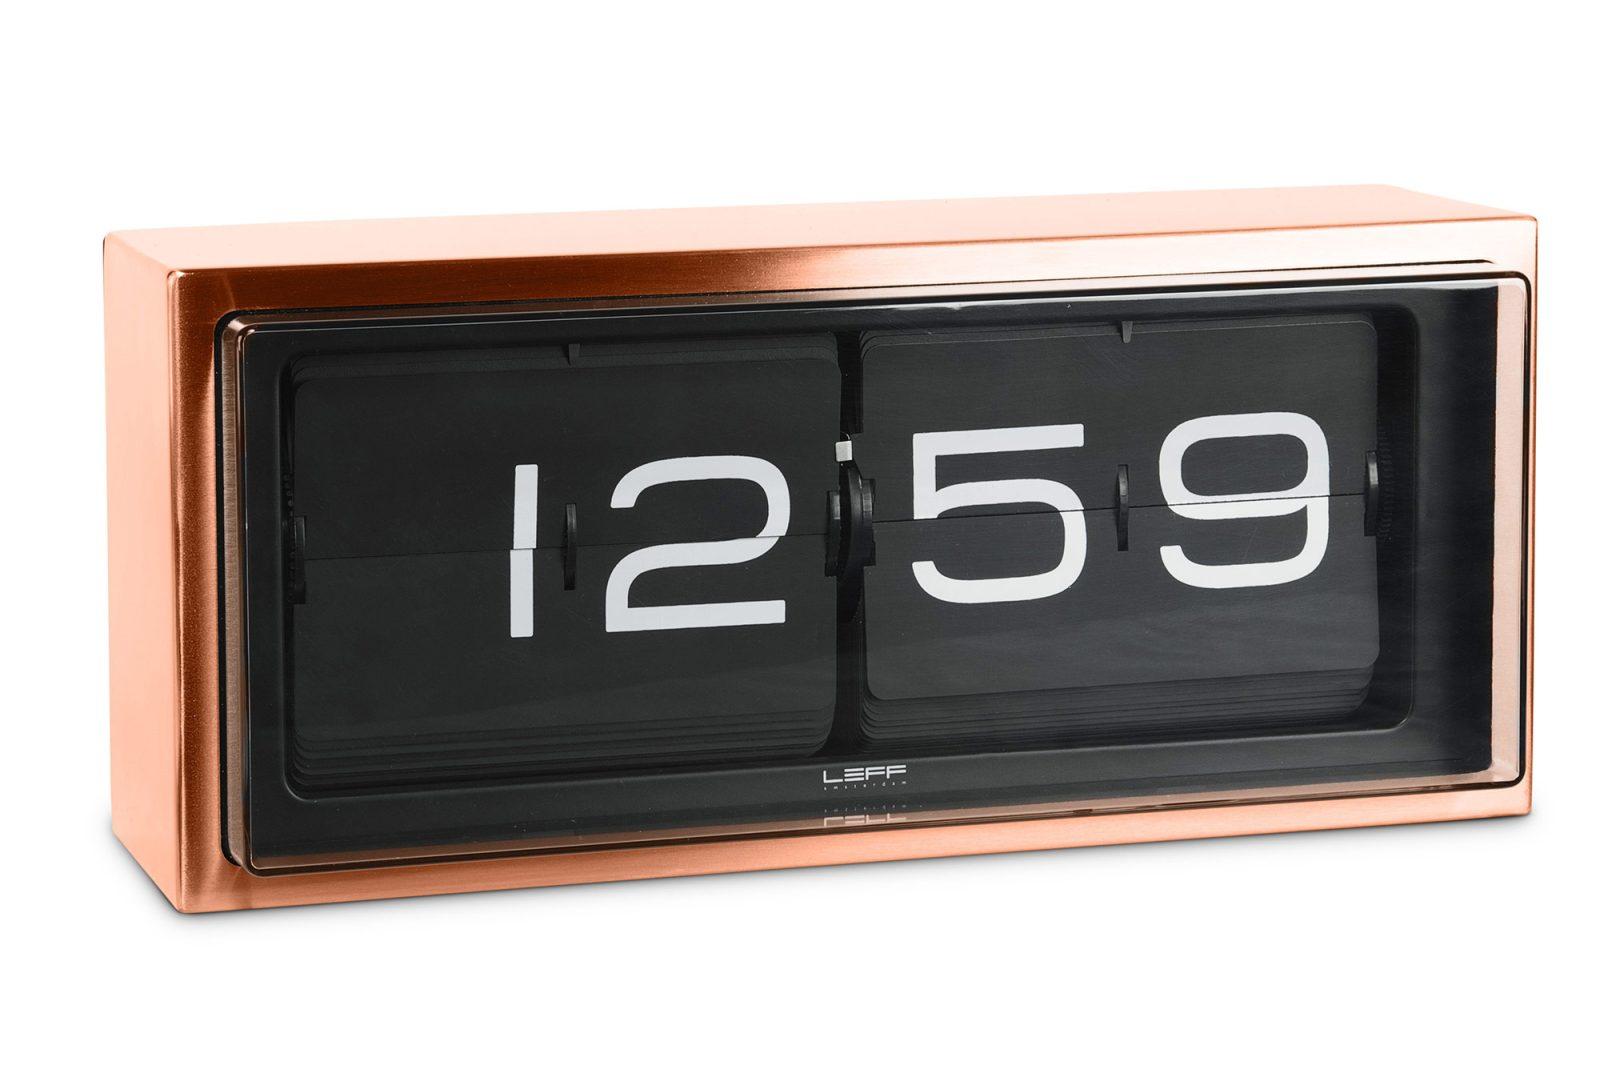 Brick Wall/Desk Clock, Copper – Black Face-31713